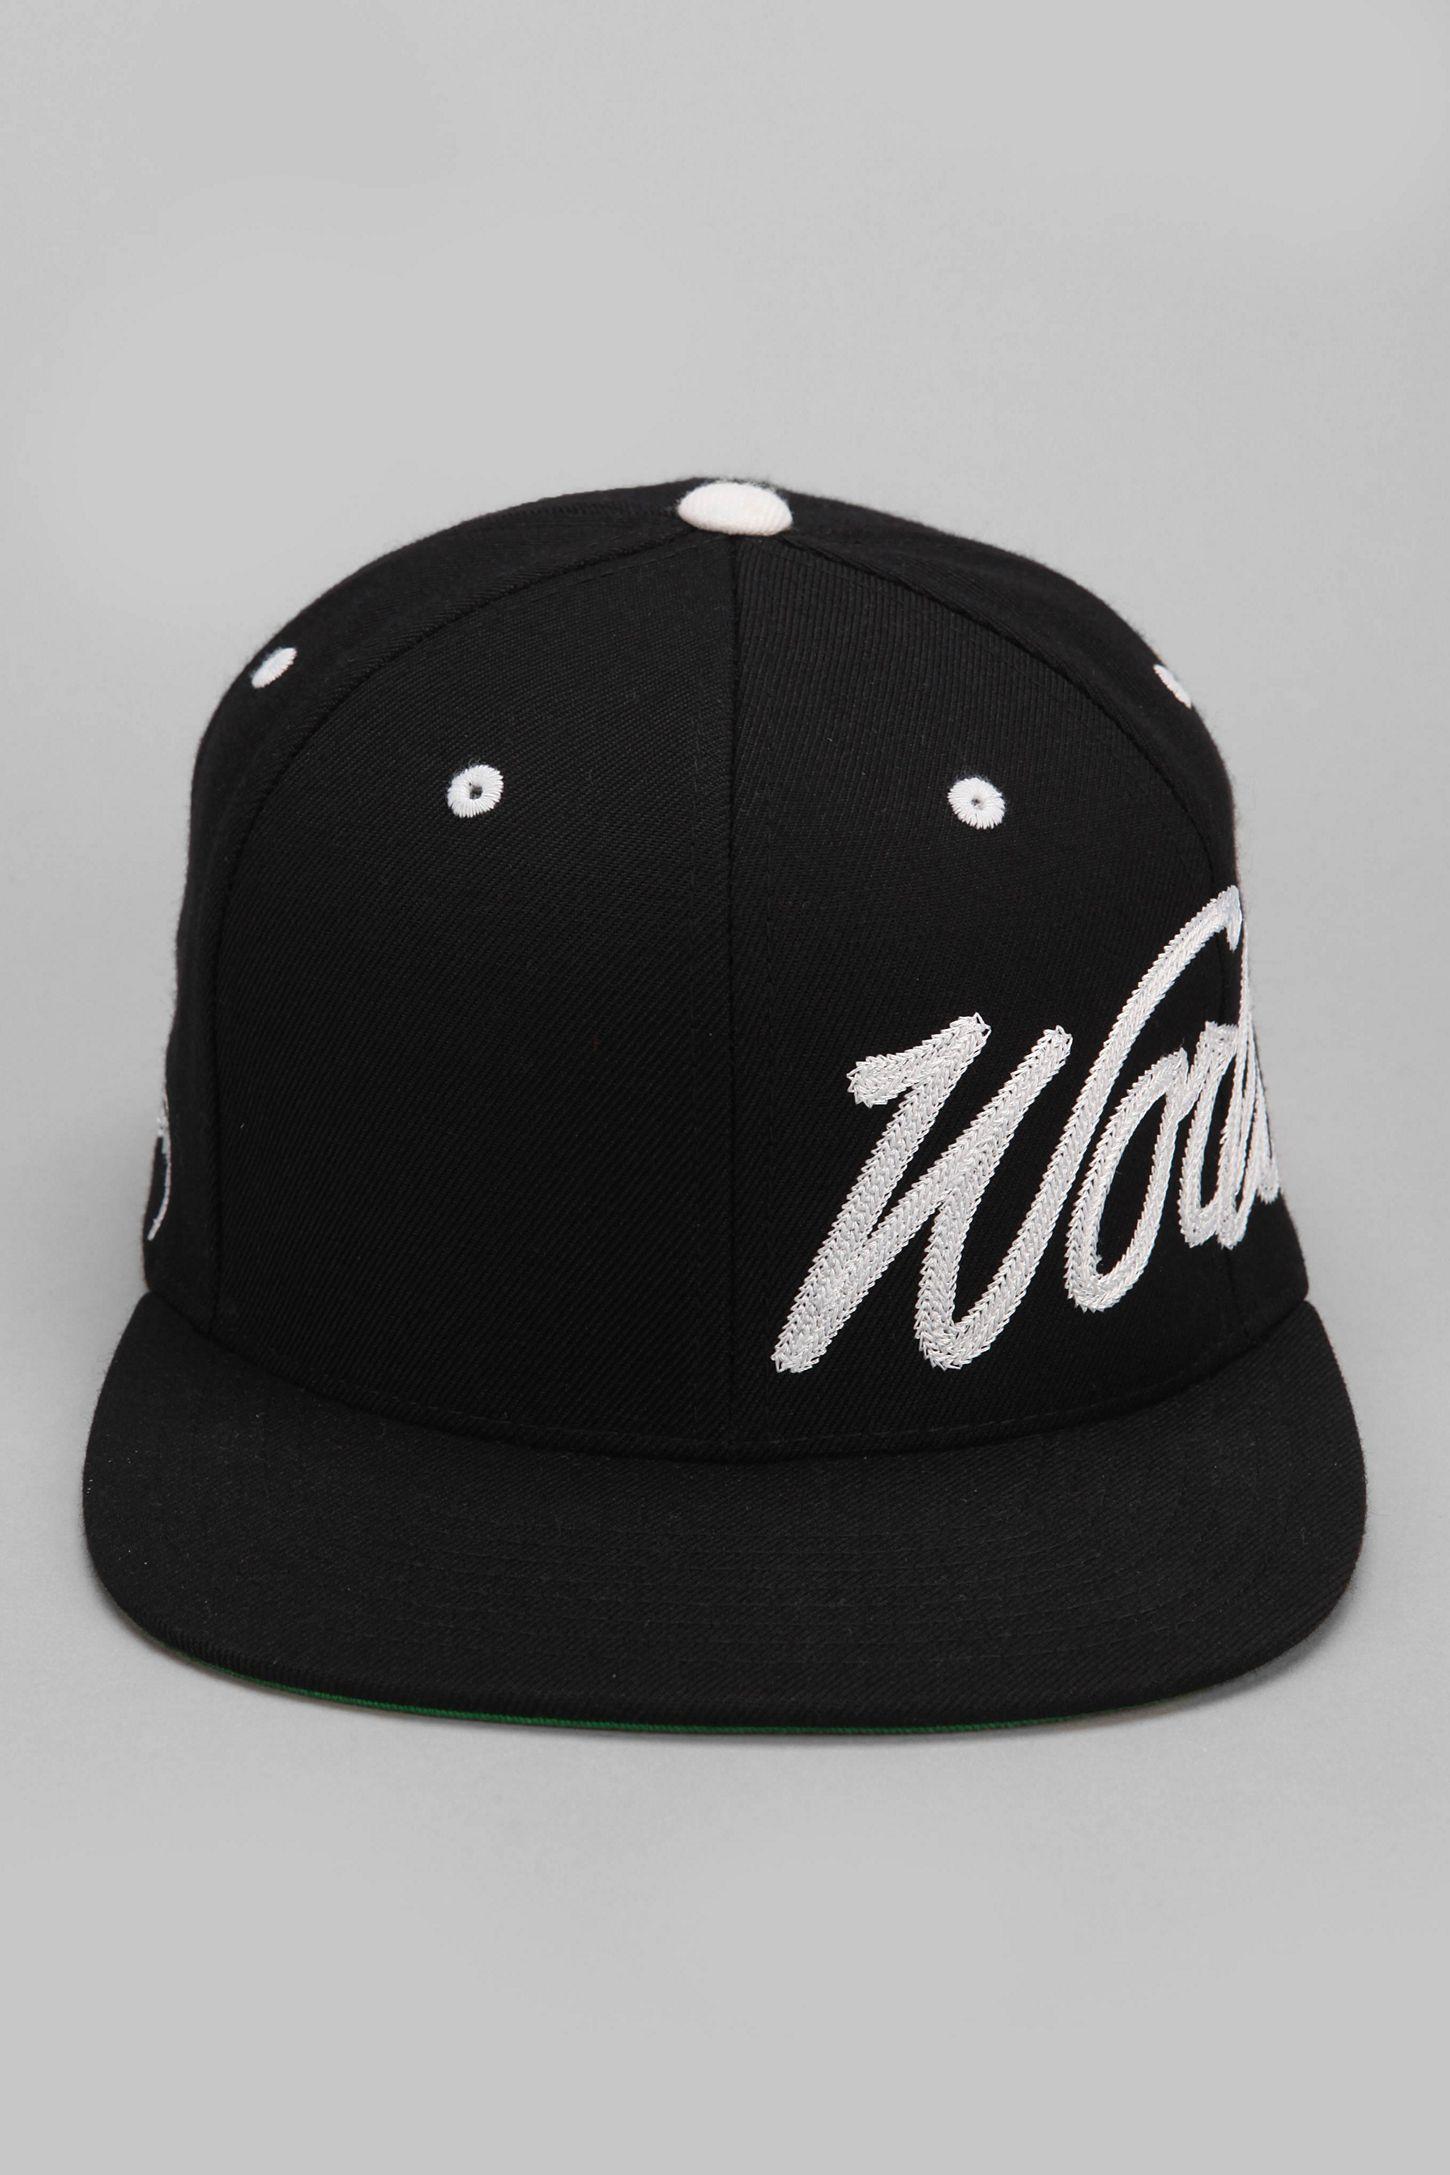 7f7be36c74b Stussy Worldwide Snapback Hat